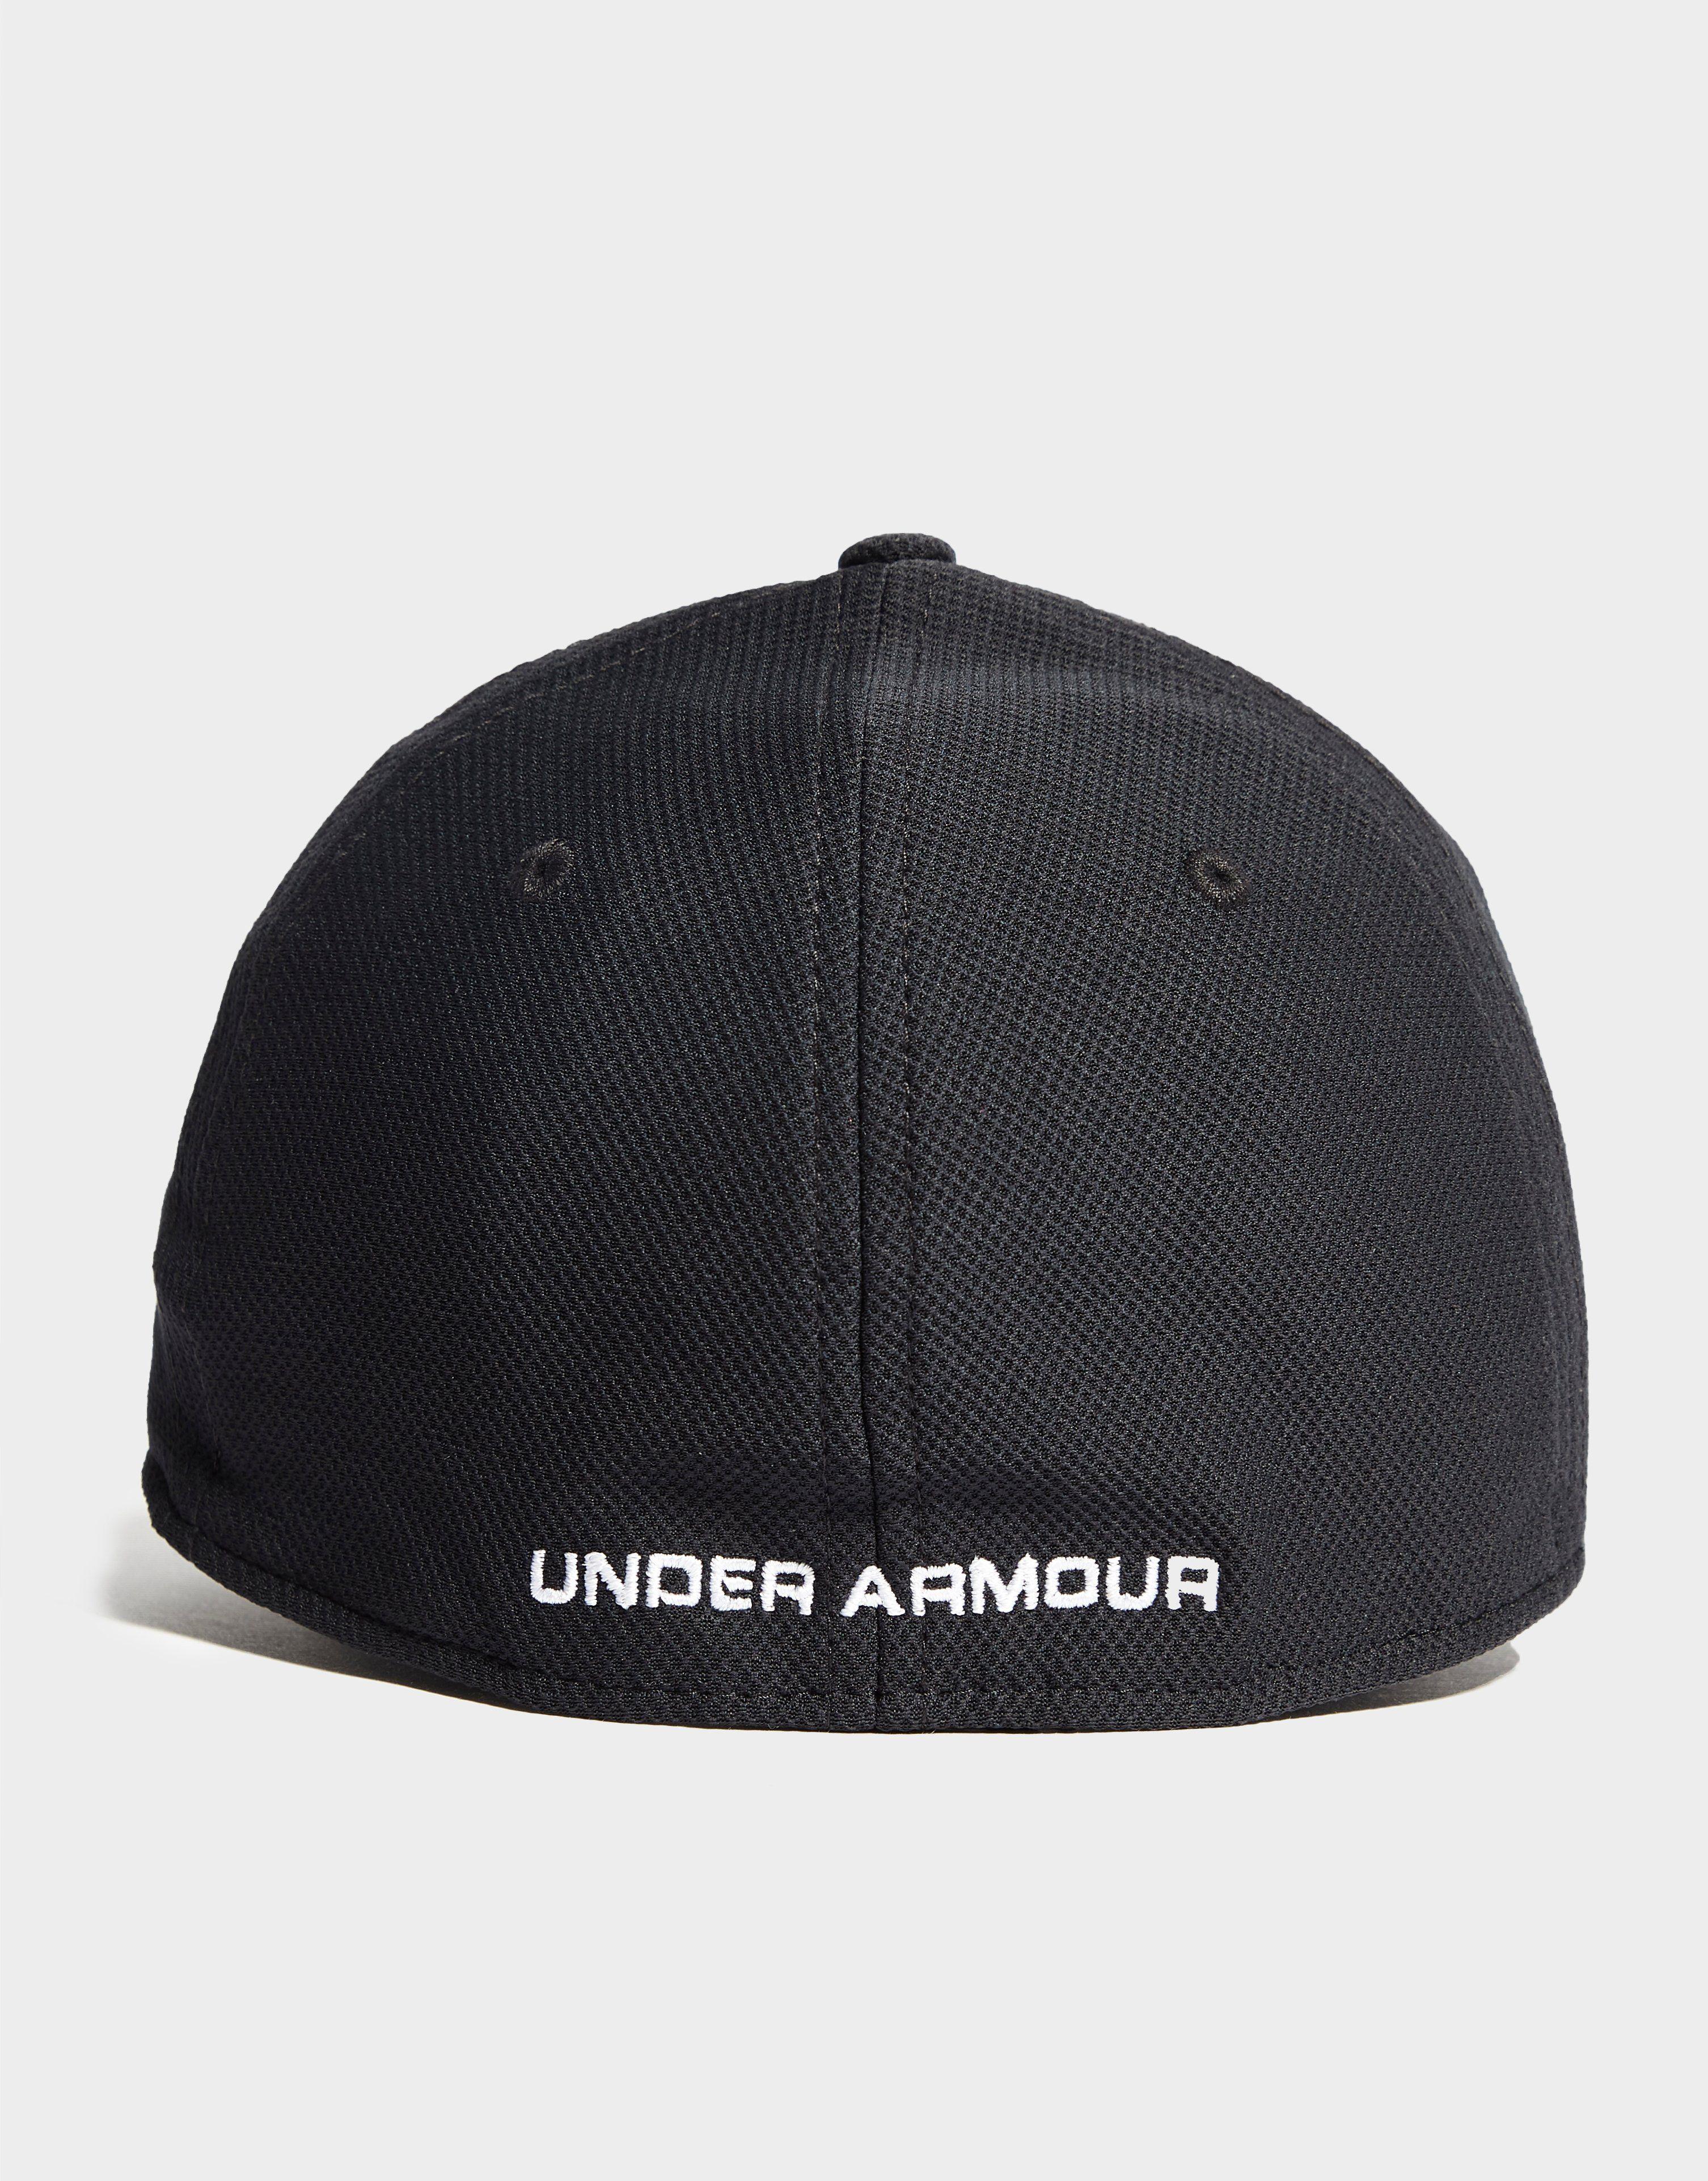 Under Armour Blitzing 2 Cap